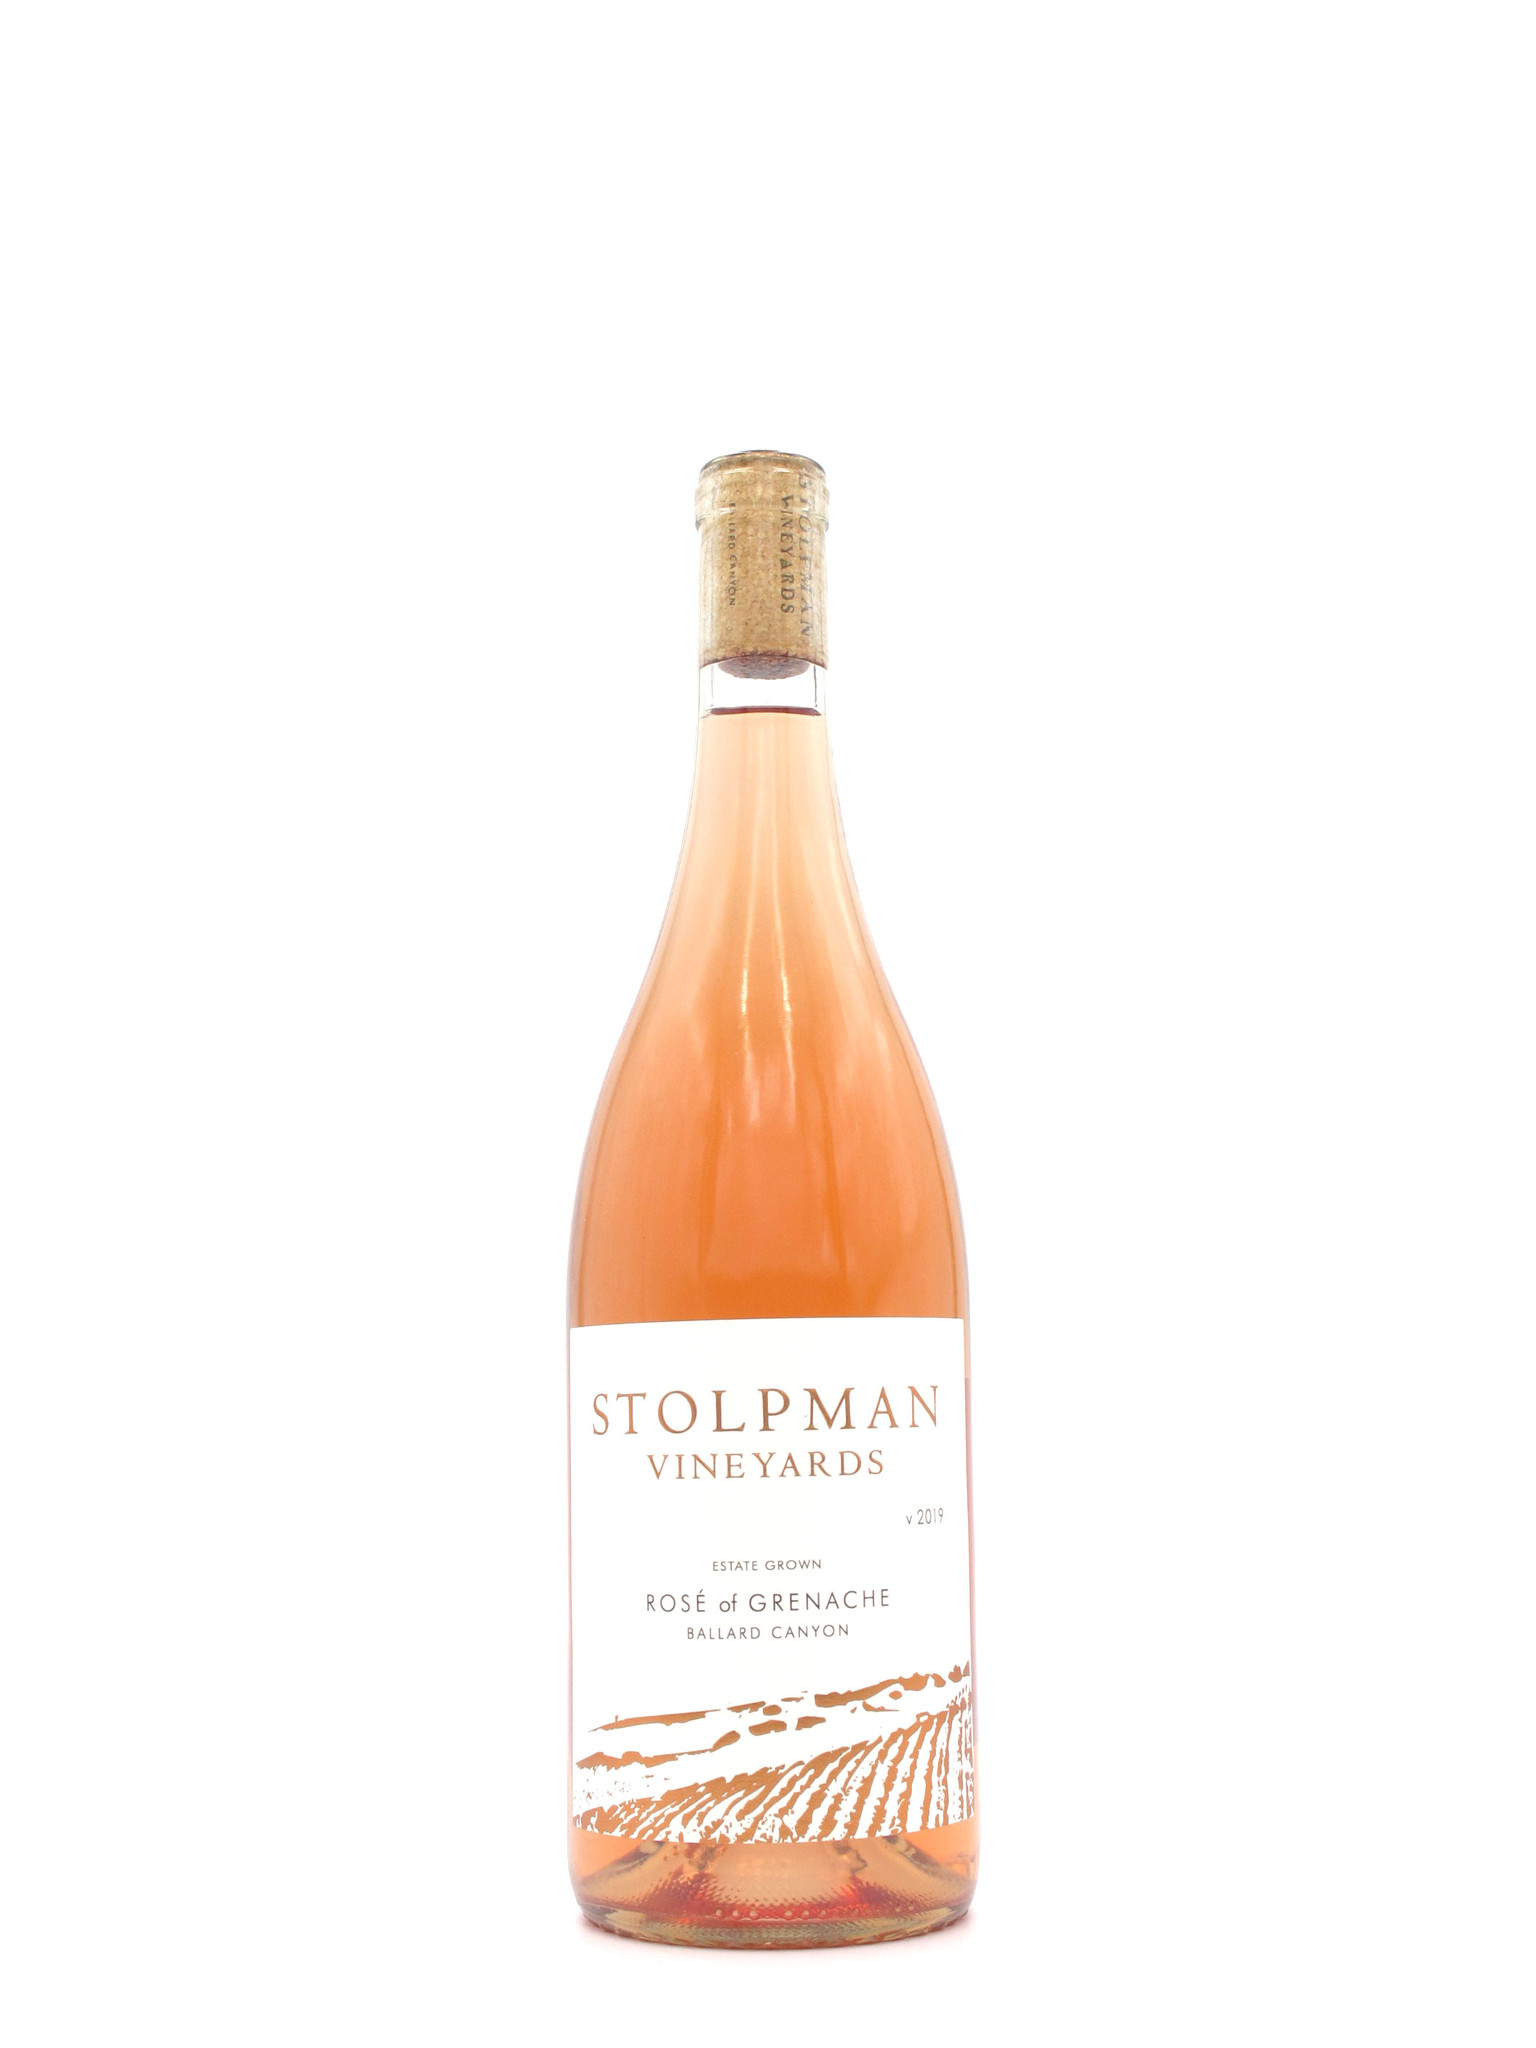 Stolpman Vineyards 2019 Stolpman Rose of Grenache Ballard Canyon